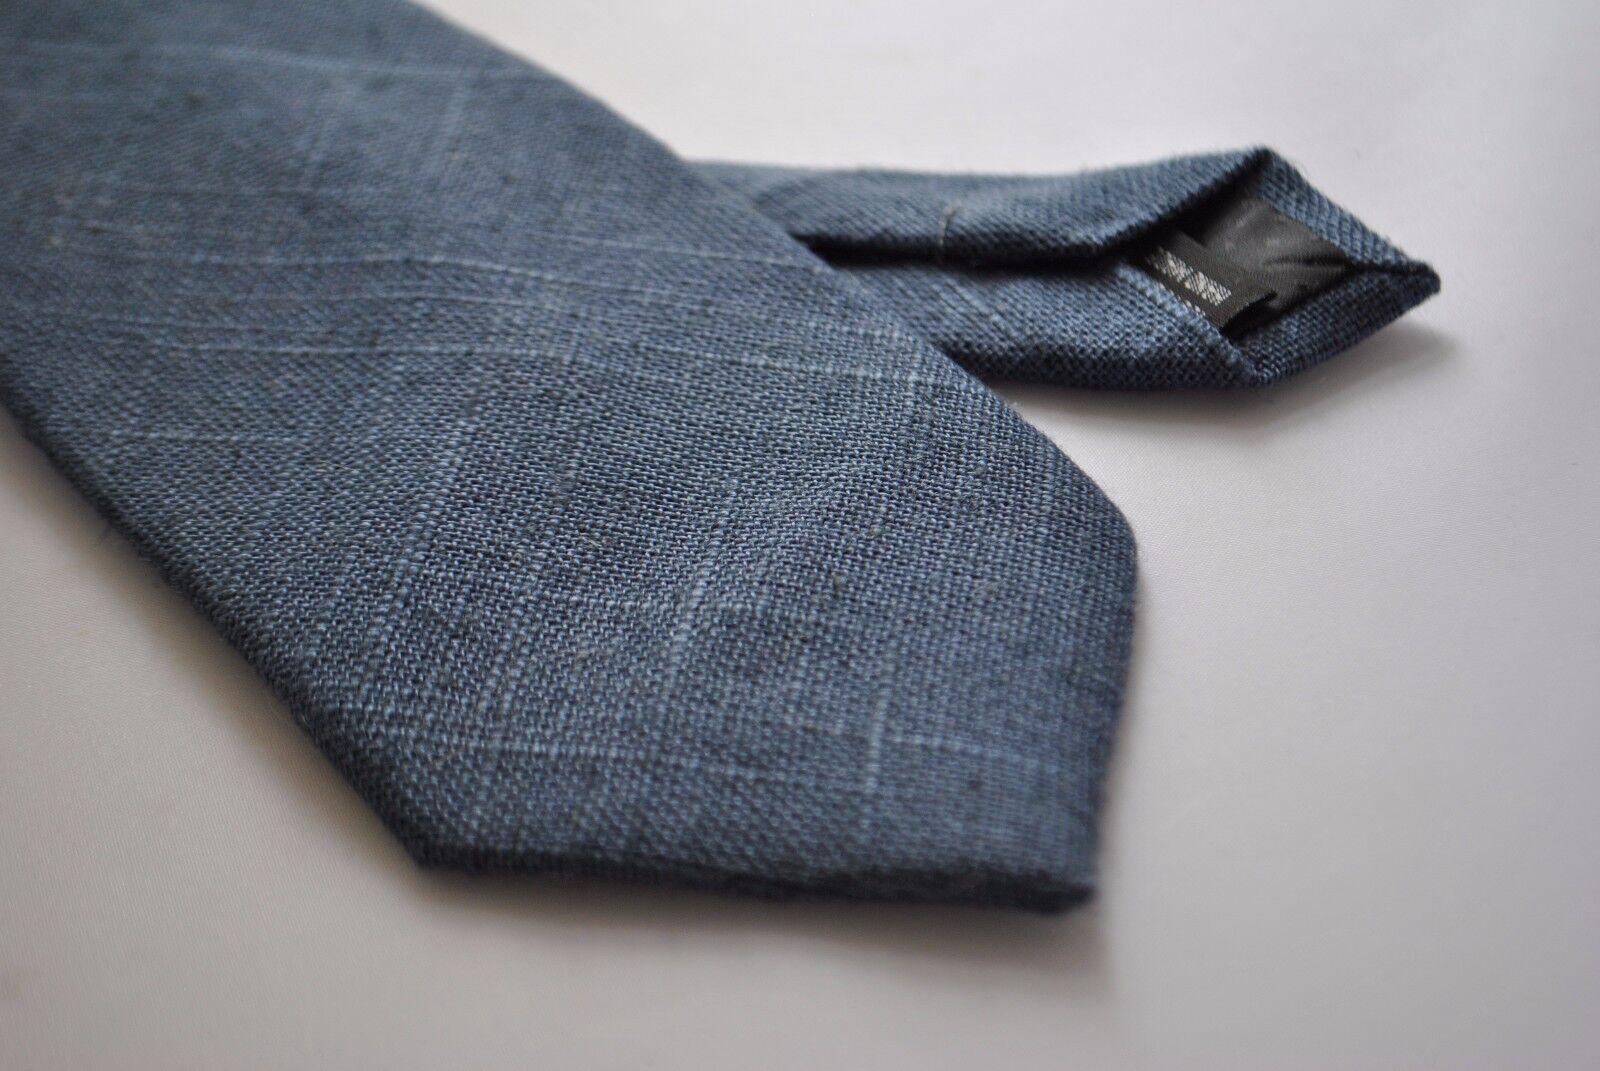 Frederick Thomas mens tie in plain navy blue linen FT2040